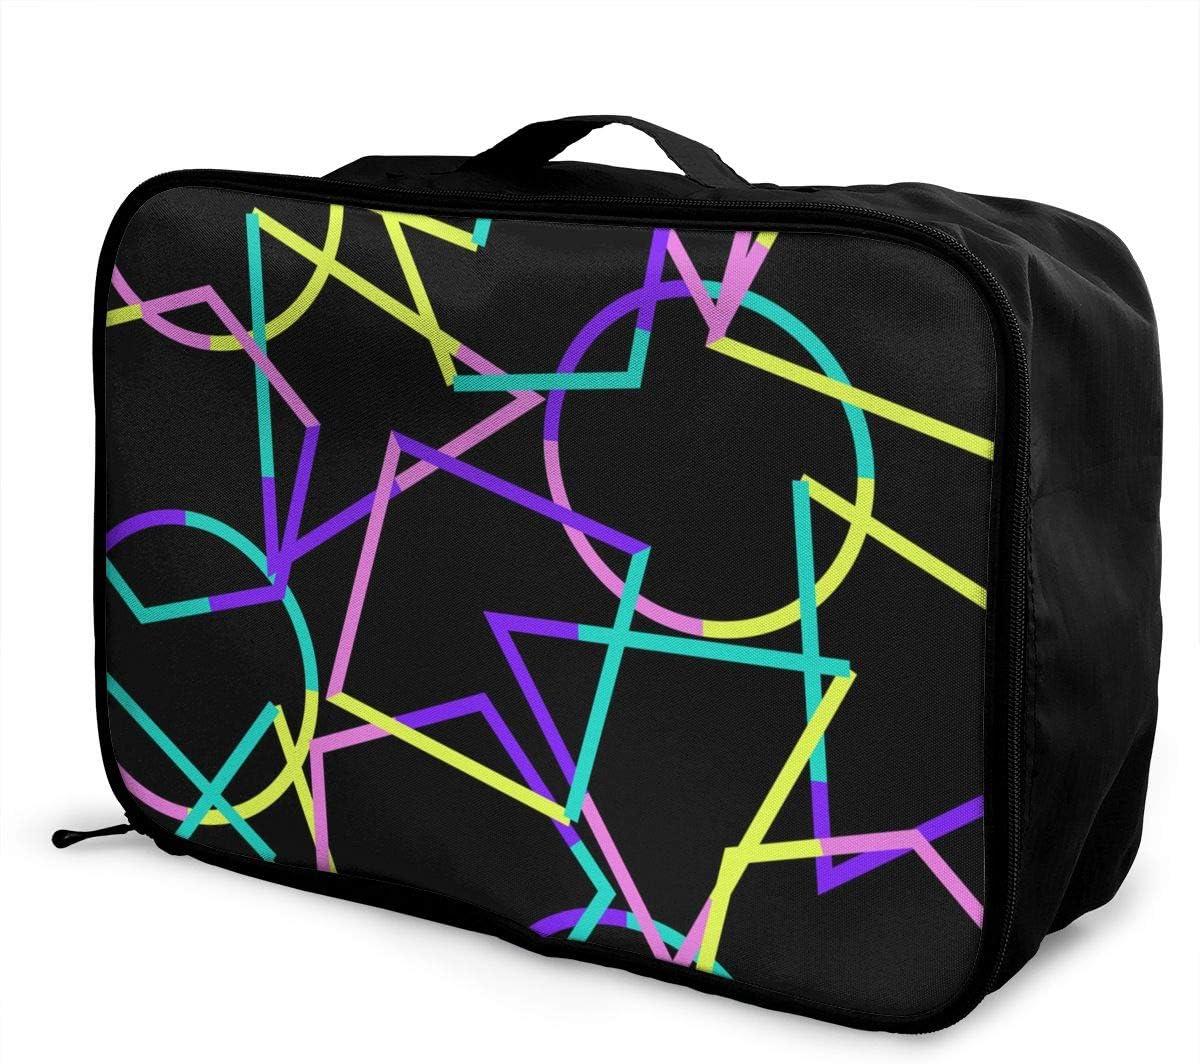 ART Travel Carry-on Luggage Weekender Bag Overnight Tote Flight Duffel In Trolley Handle